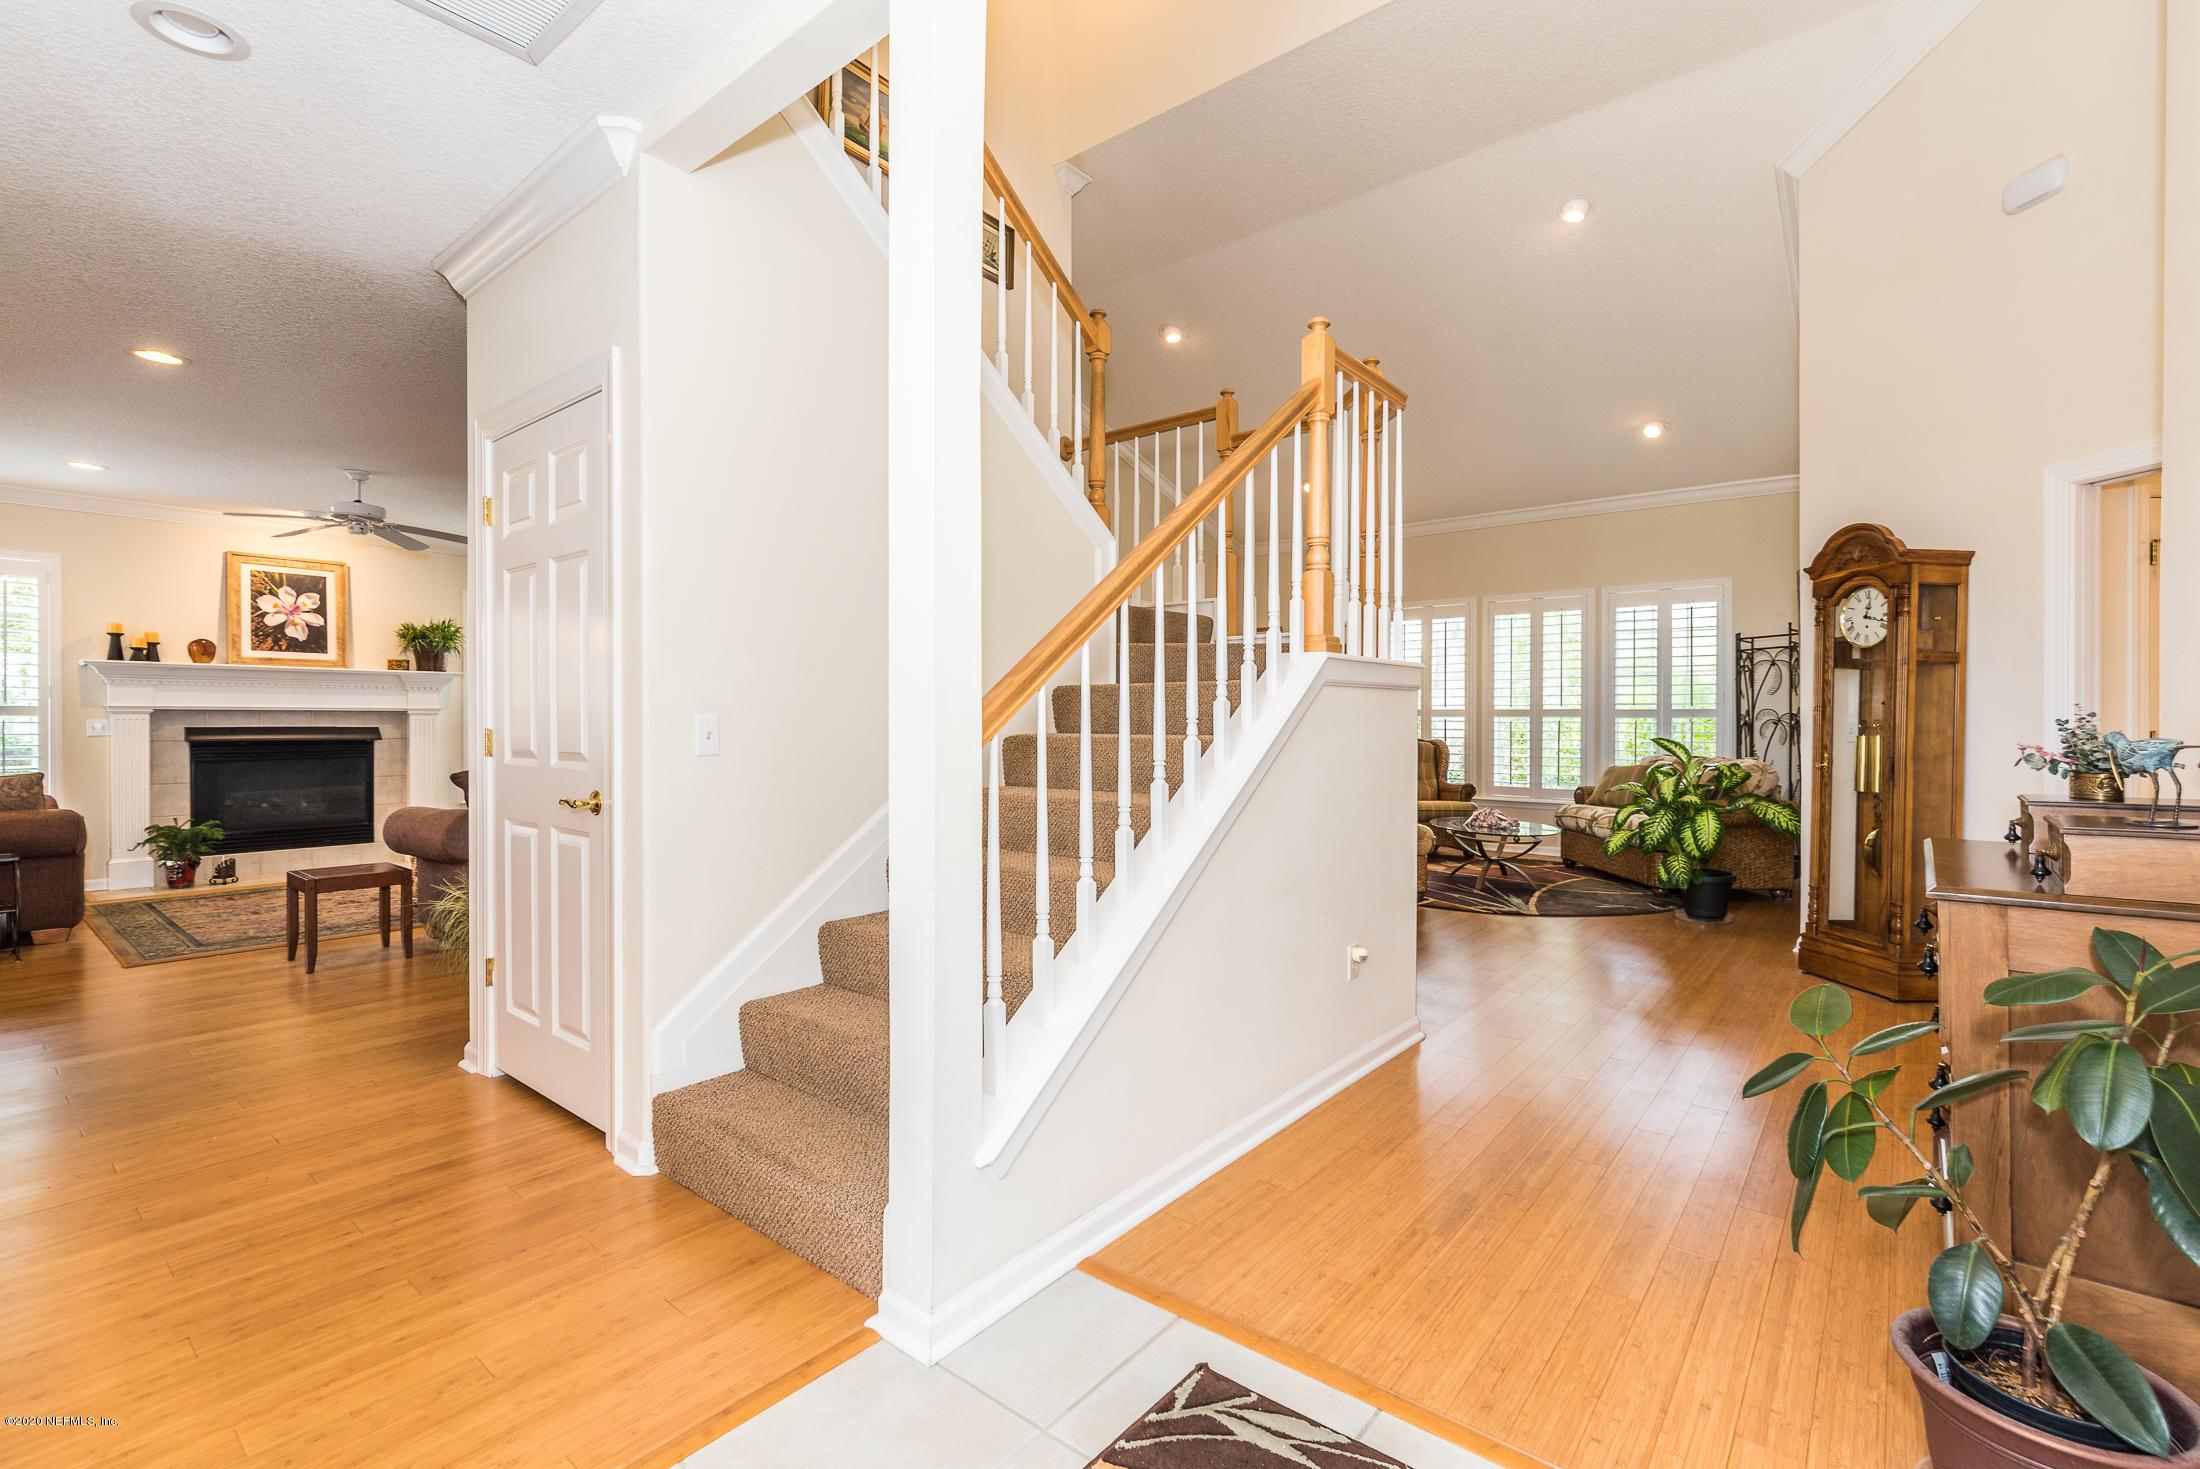 826 SUMMER BAY, ST AUGUSTINE, FLORIDA 32080, 3 Bedrooms Bedrooms, ,2 BathroomsBathrooms,Residential,For sale,SUMMER BAY,1037629